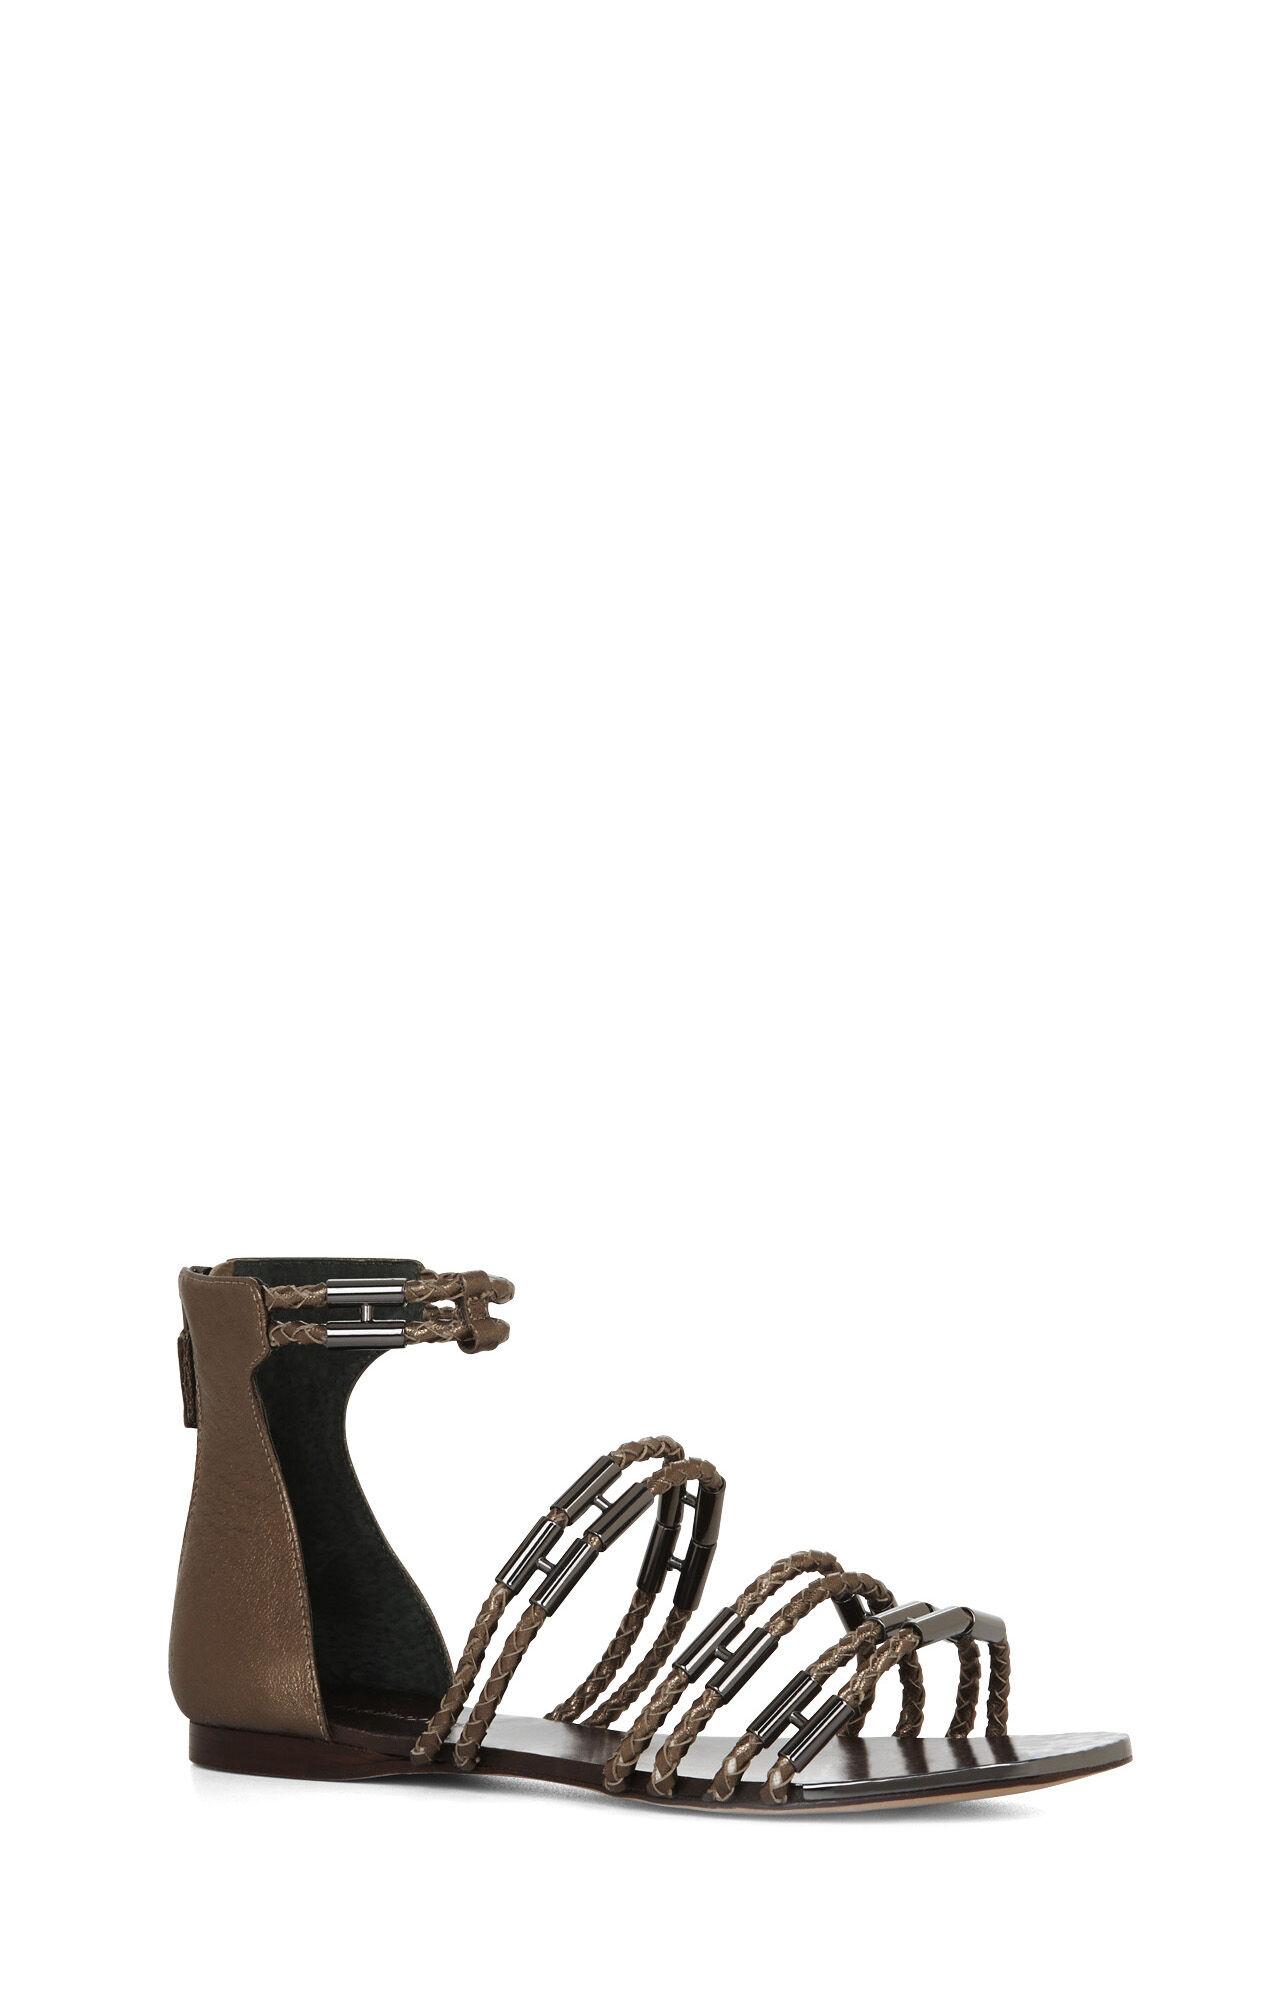 Royale Metallic-Trim Sandal